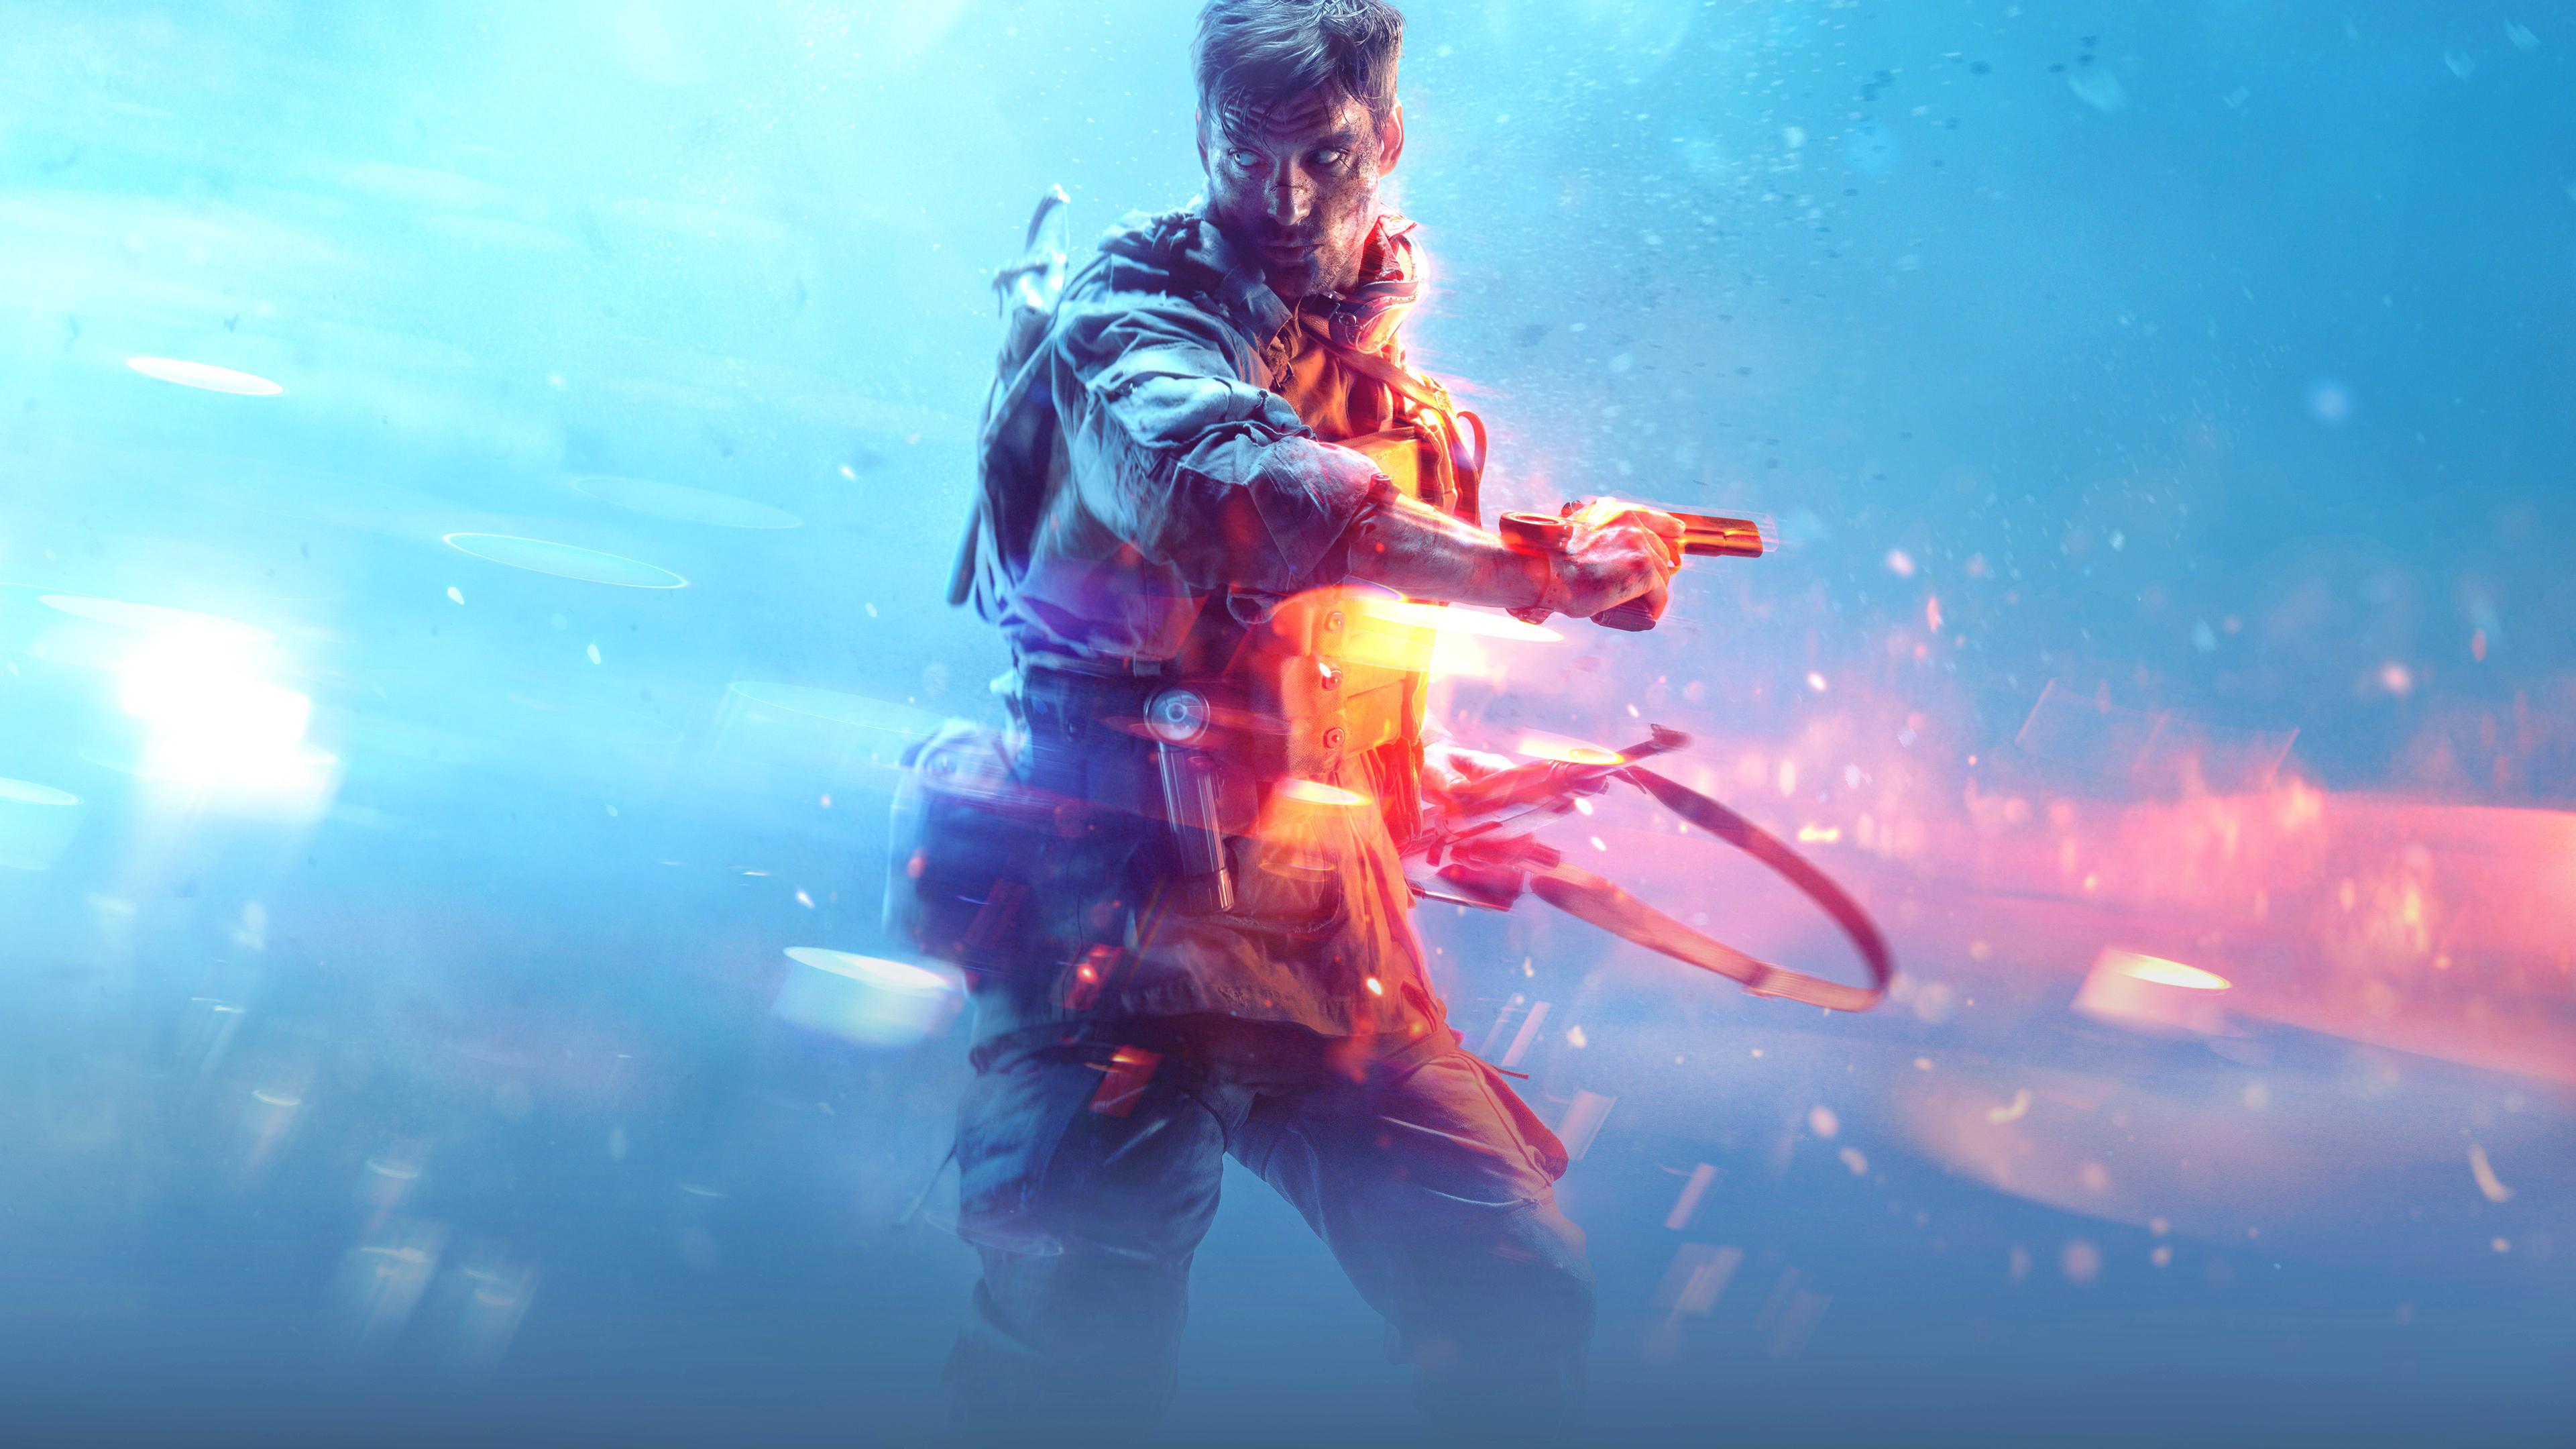 Battlefield V 4k Ultra Papel de Parede HD | Plano de Fundo | 3841x2160 | ID:922367 - Wallpaper Abyss